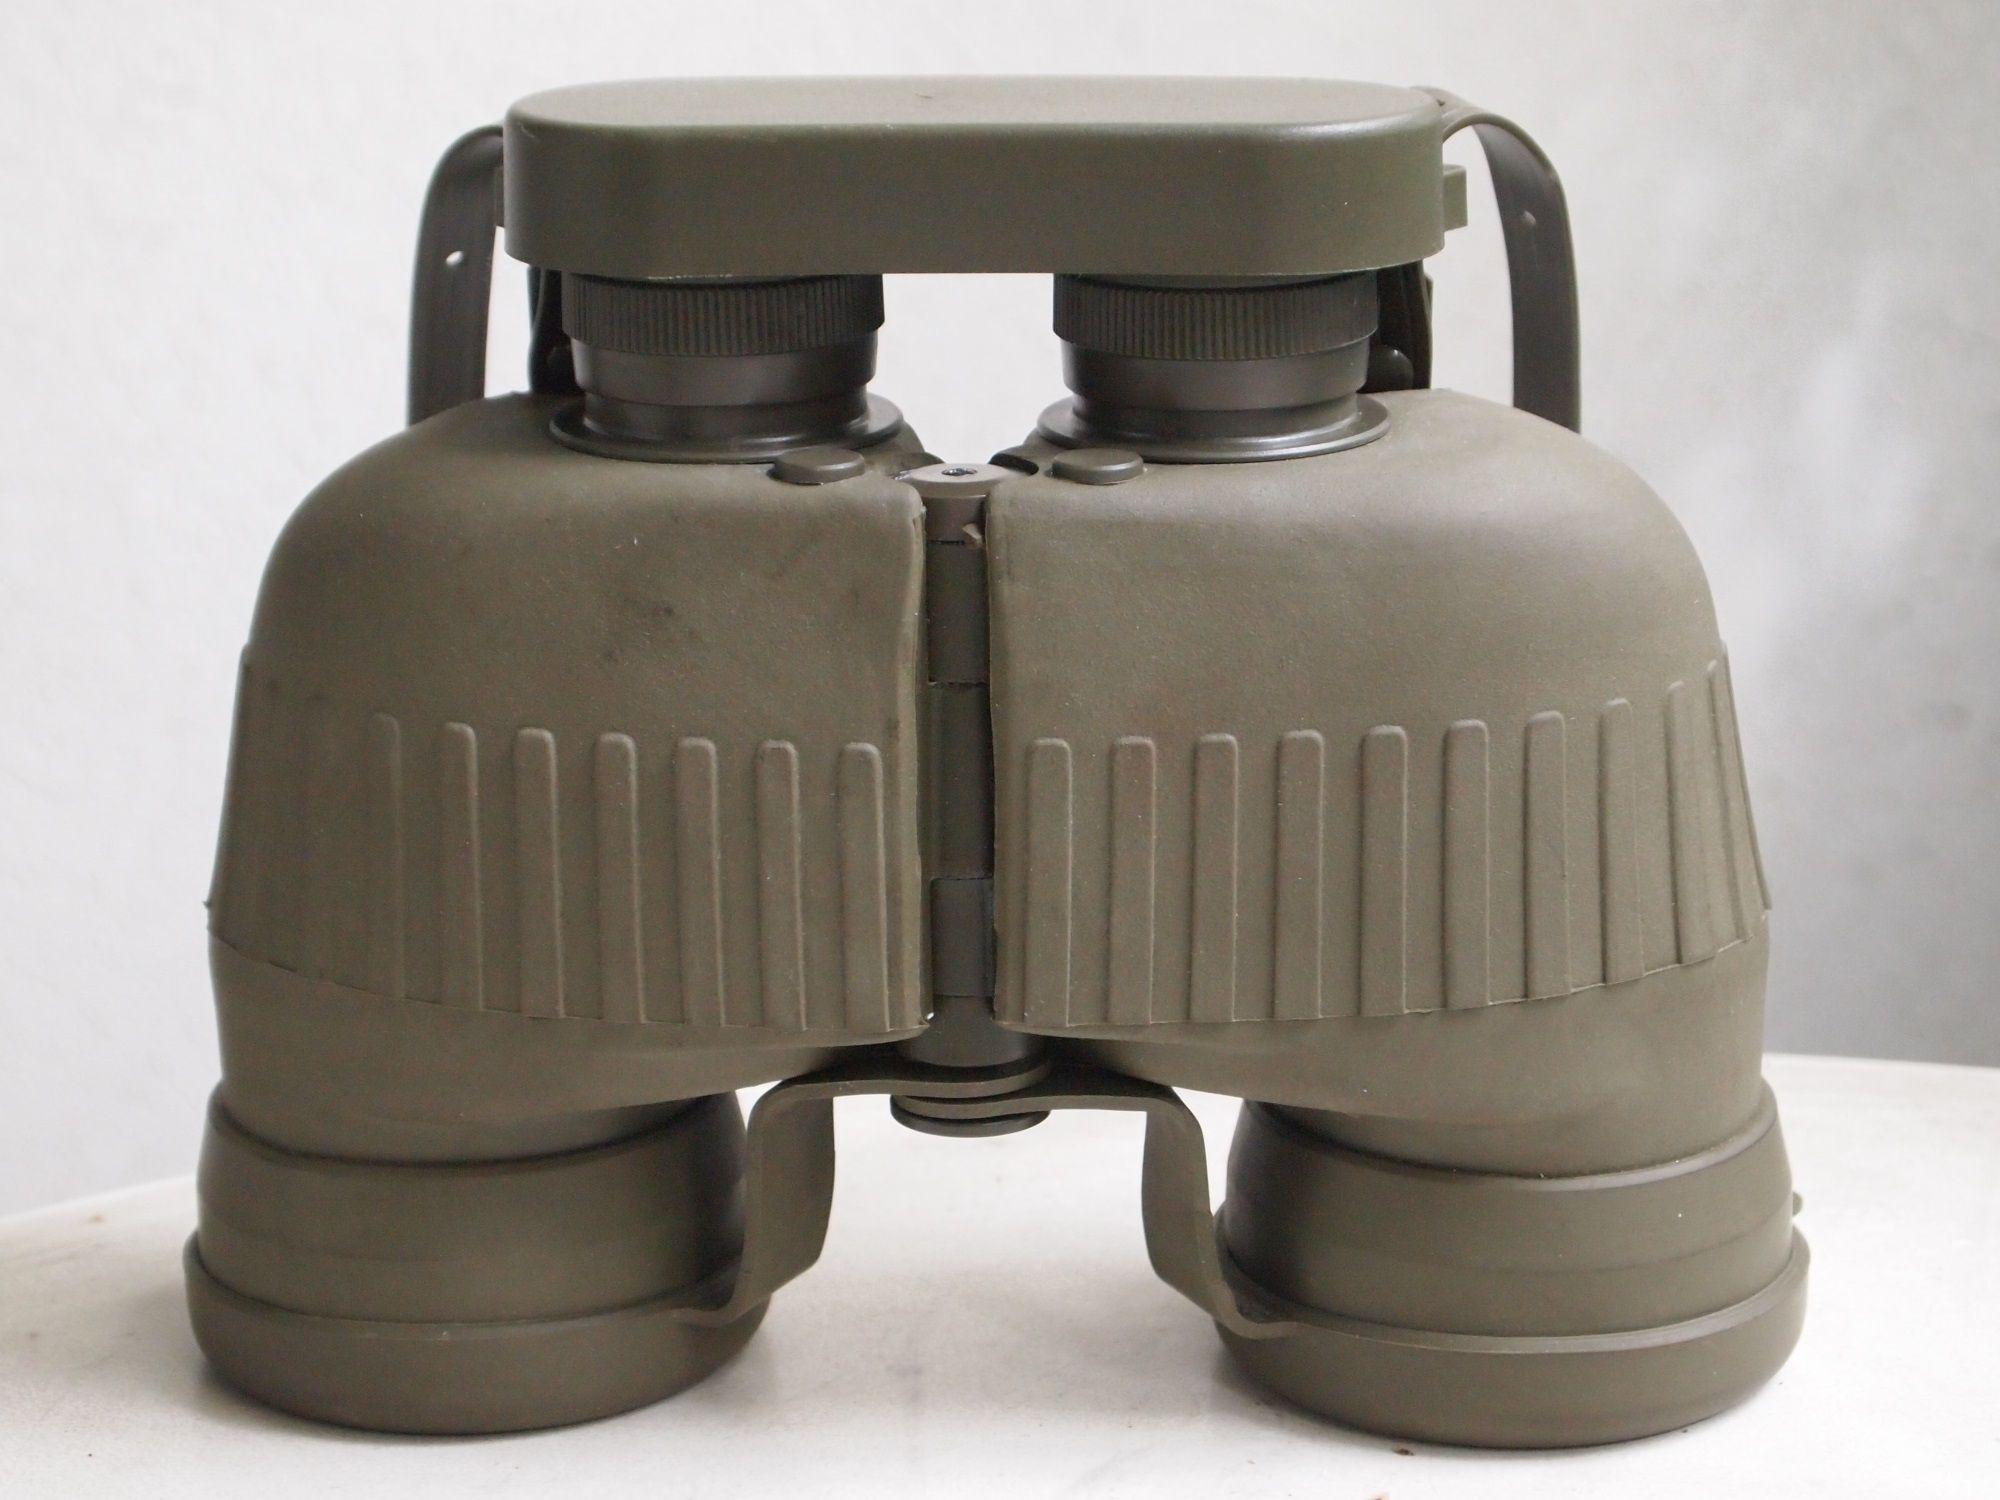 Steiner m22 7x50 militär desert storm fernglas militär ferngläser